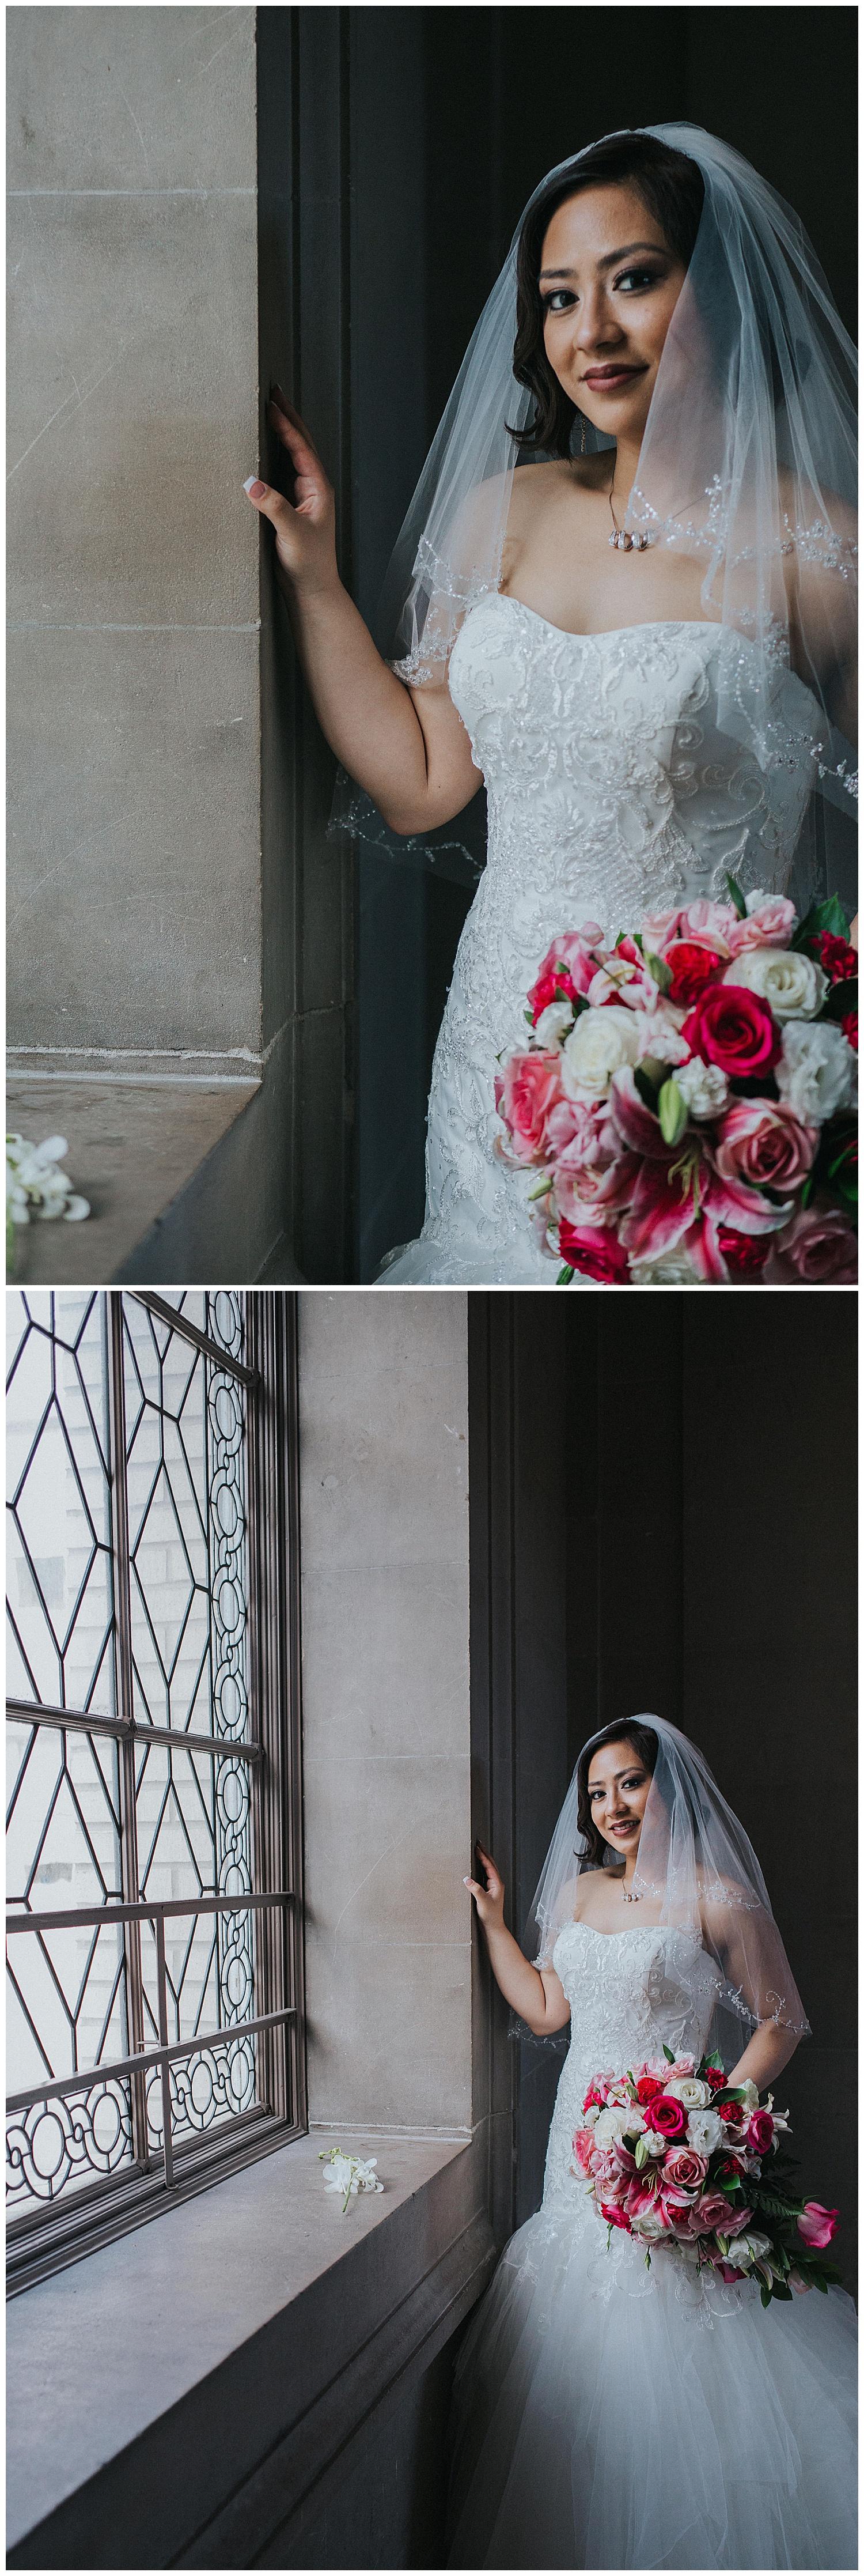 khariza-rae-photography-bay-area-wedding-photographer_0115.jpg